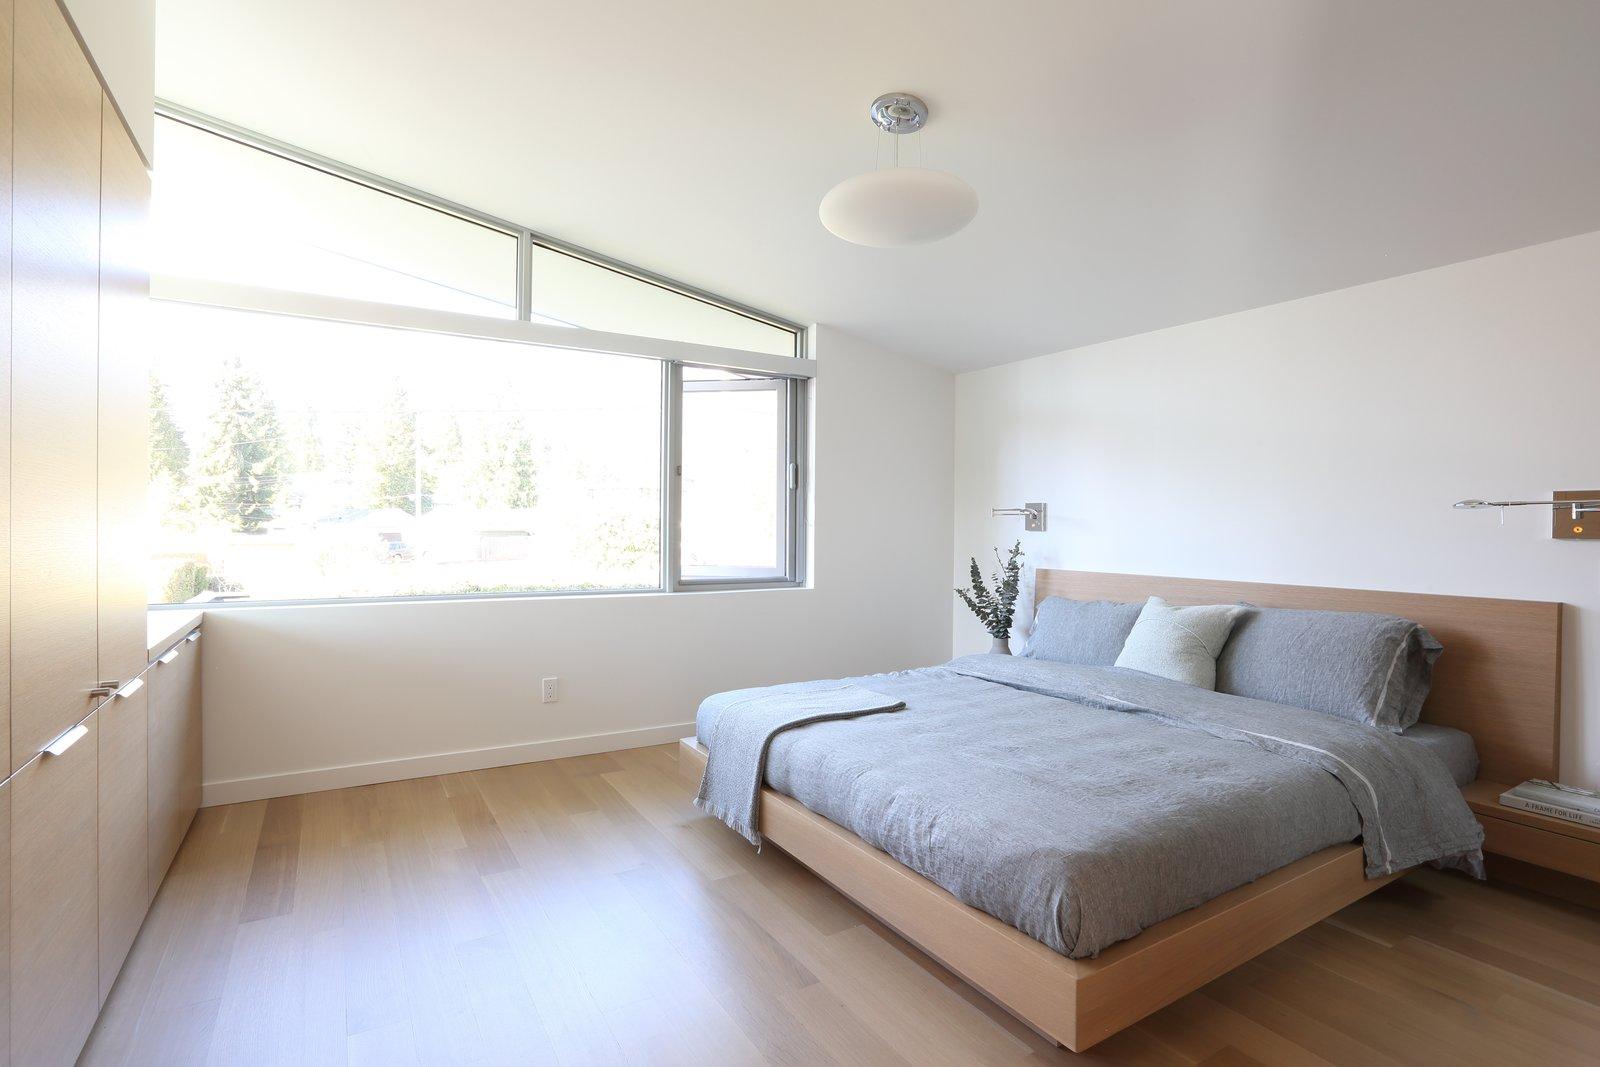 Bedroom, Bed, Wardrobe, Storage, Wall Lighting, Light Hardwood Floor, and Pendant Lighting Master bedroom  The Edge House